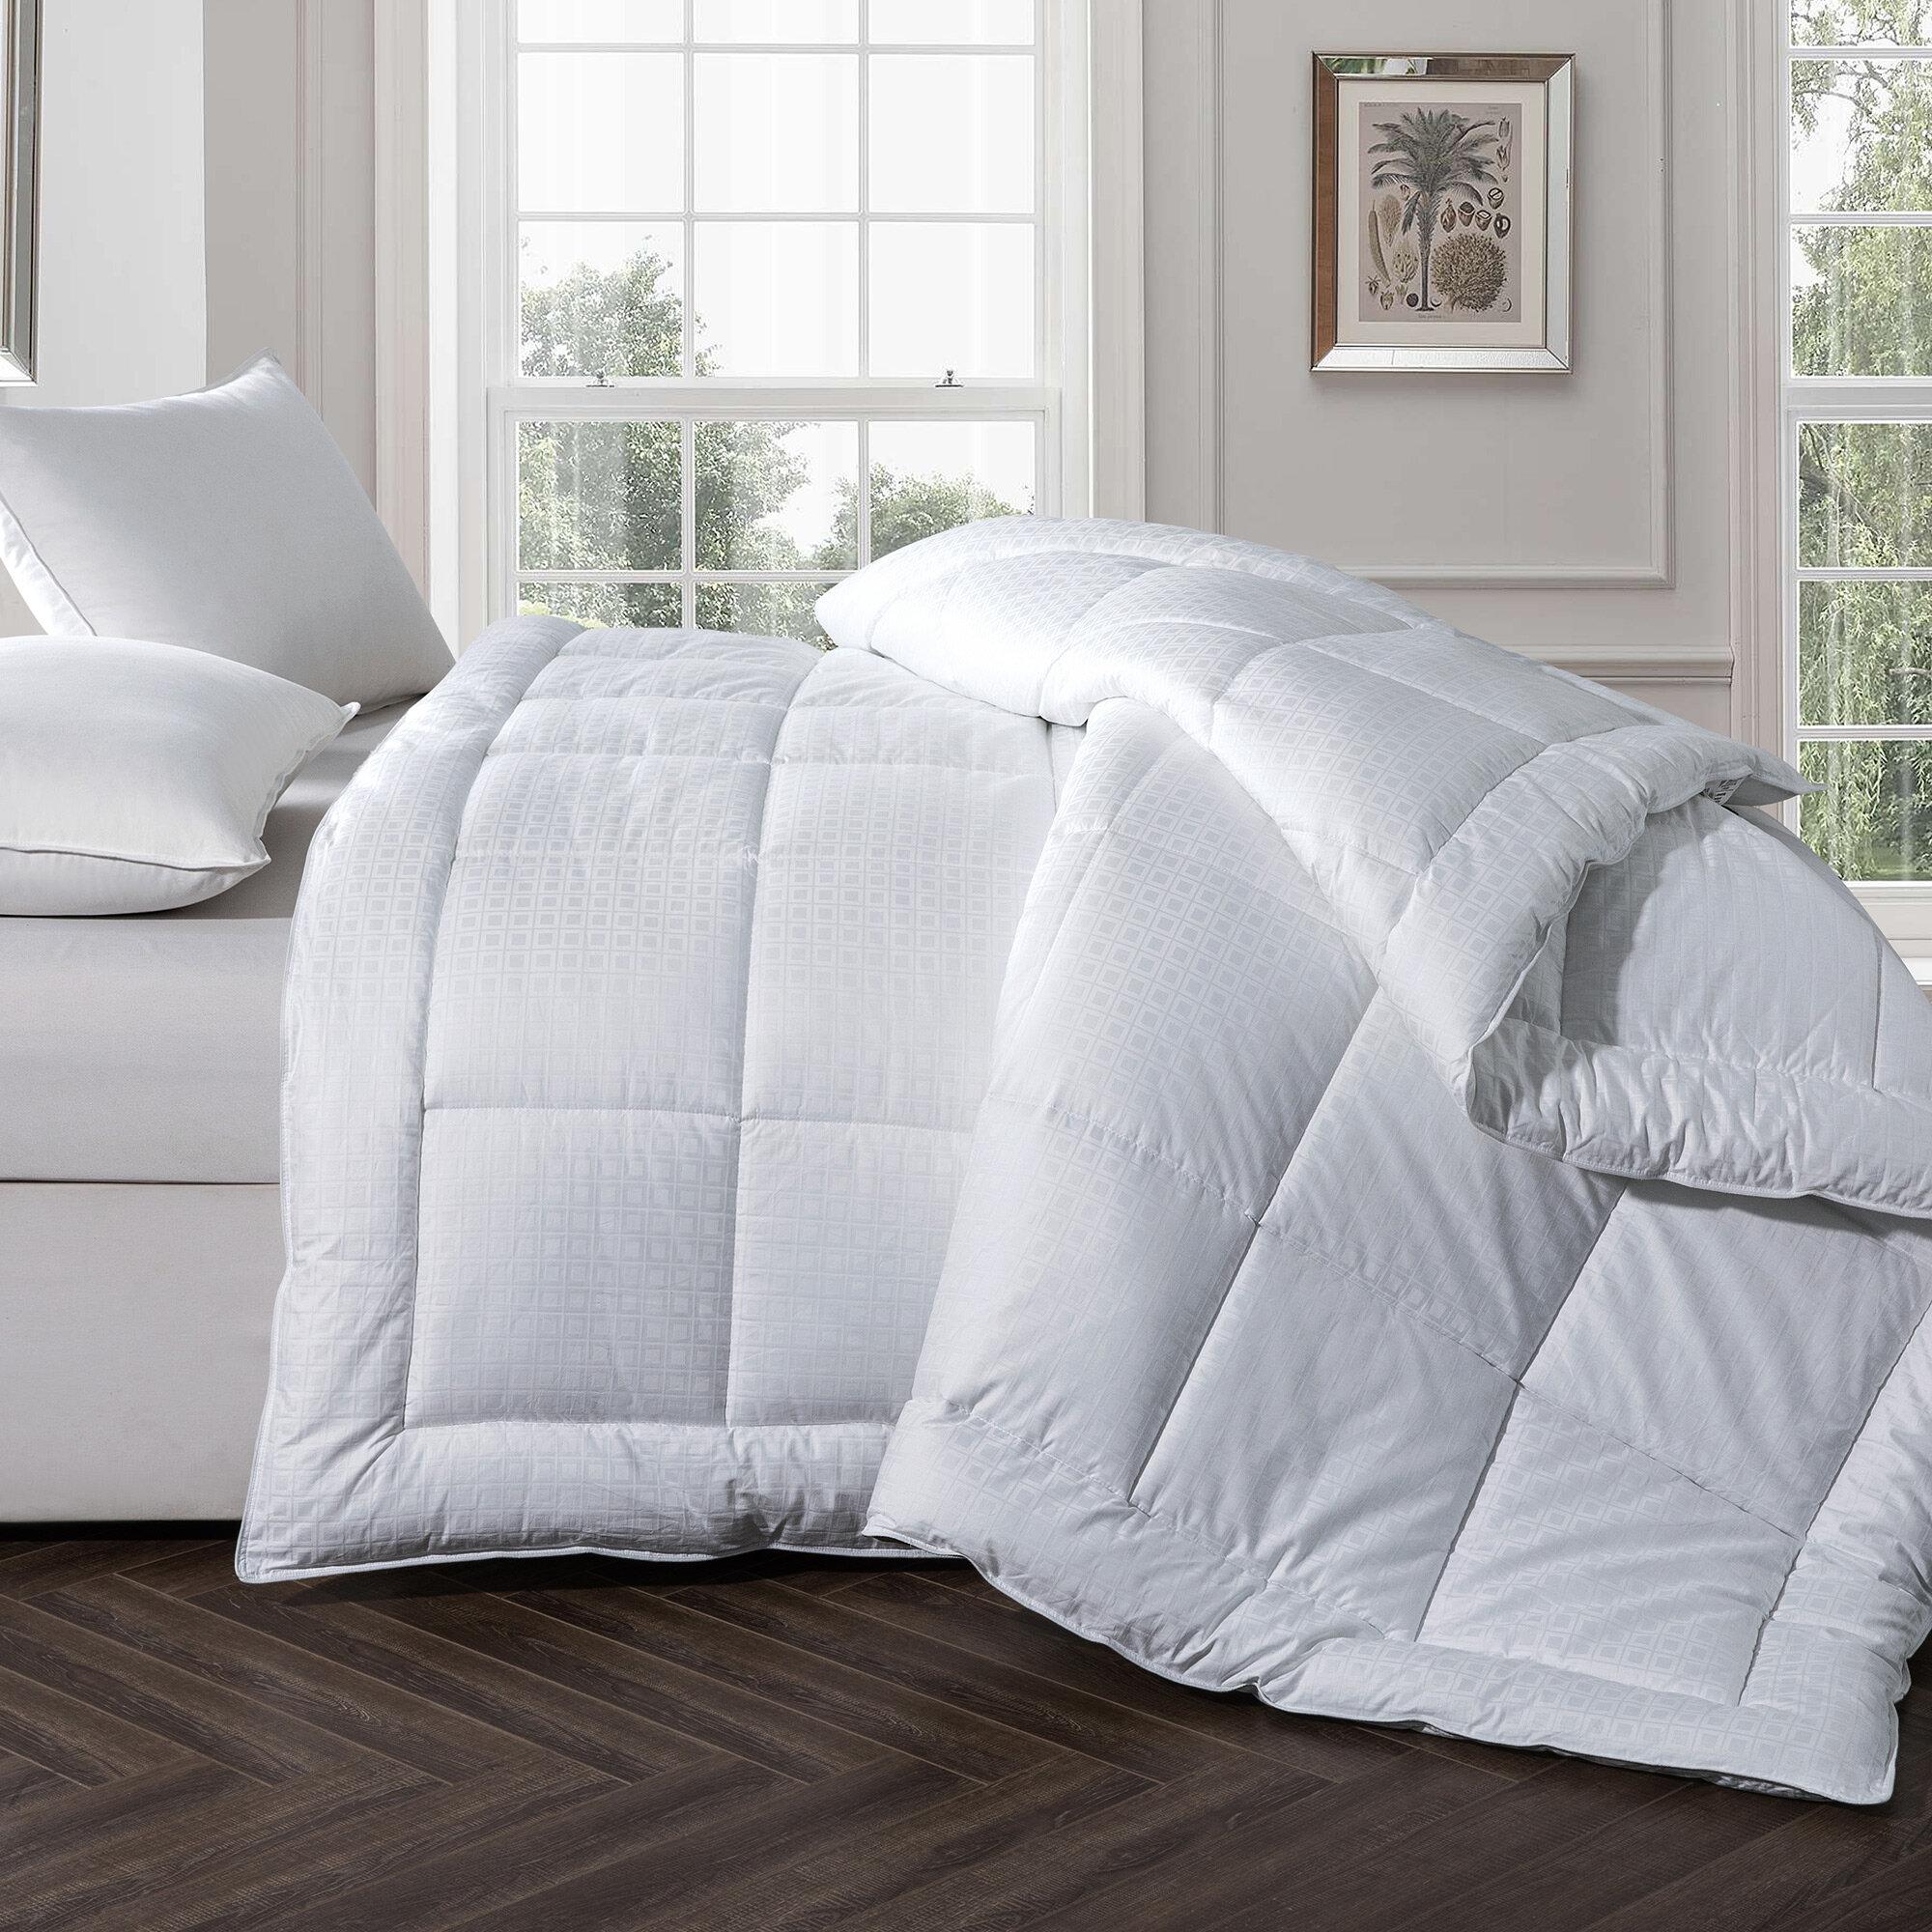 Elegant Comfort All Season Comforter and Year Round Medium Weight Super Soft Dow